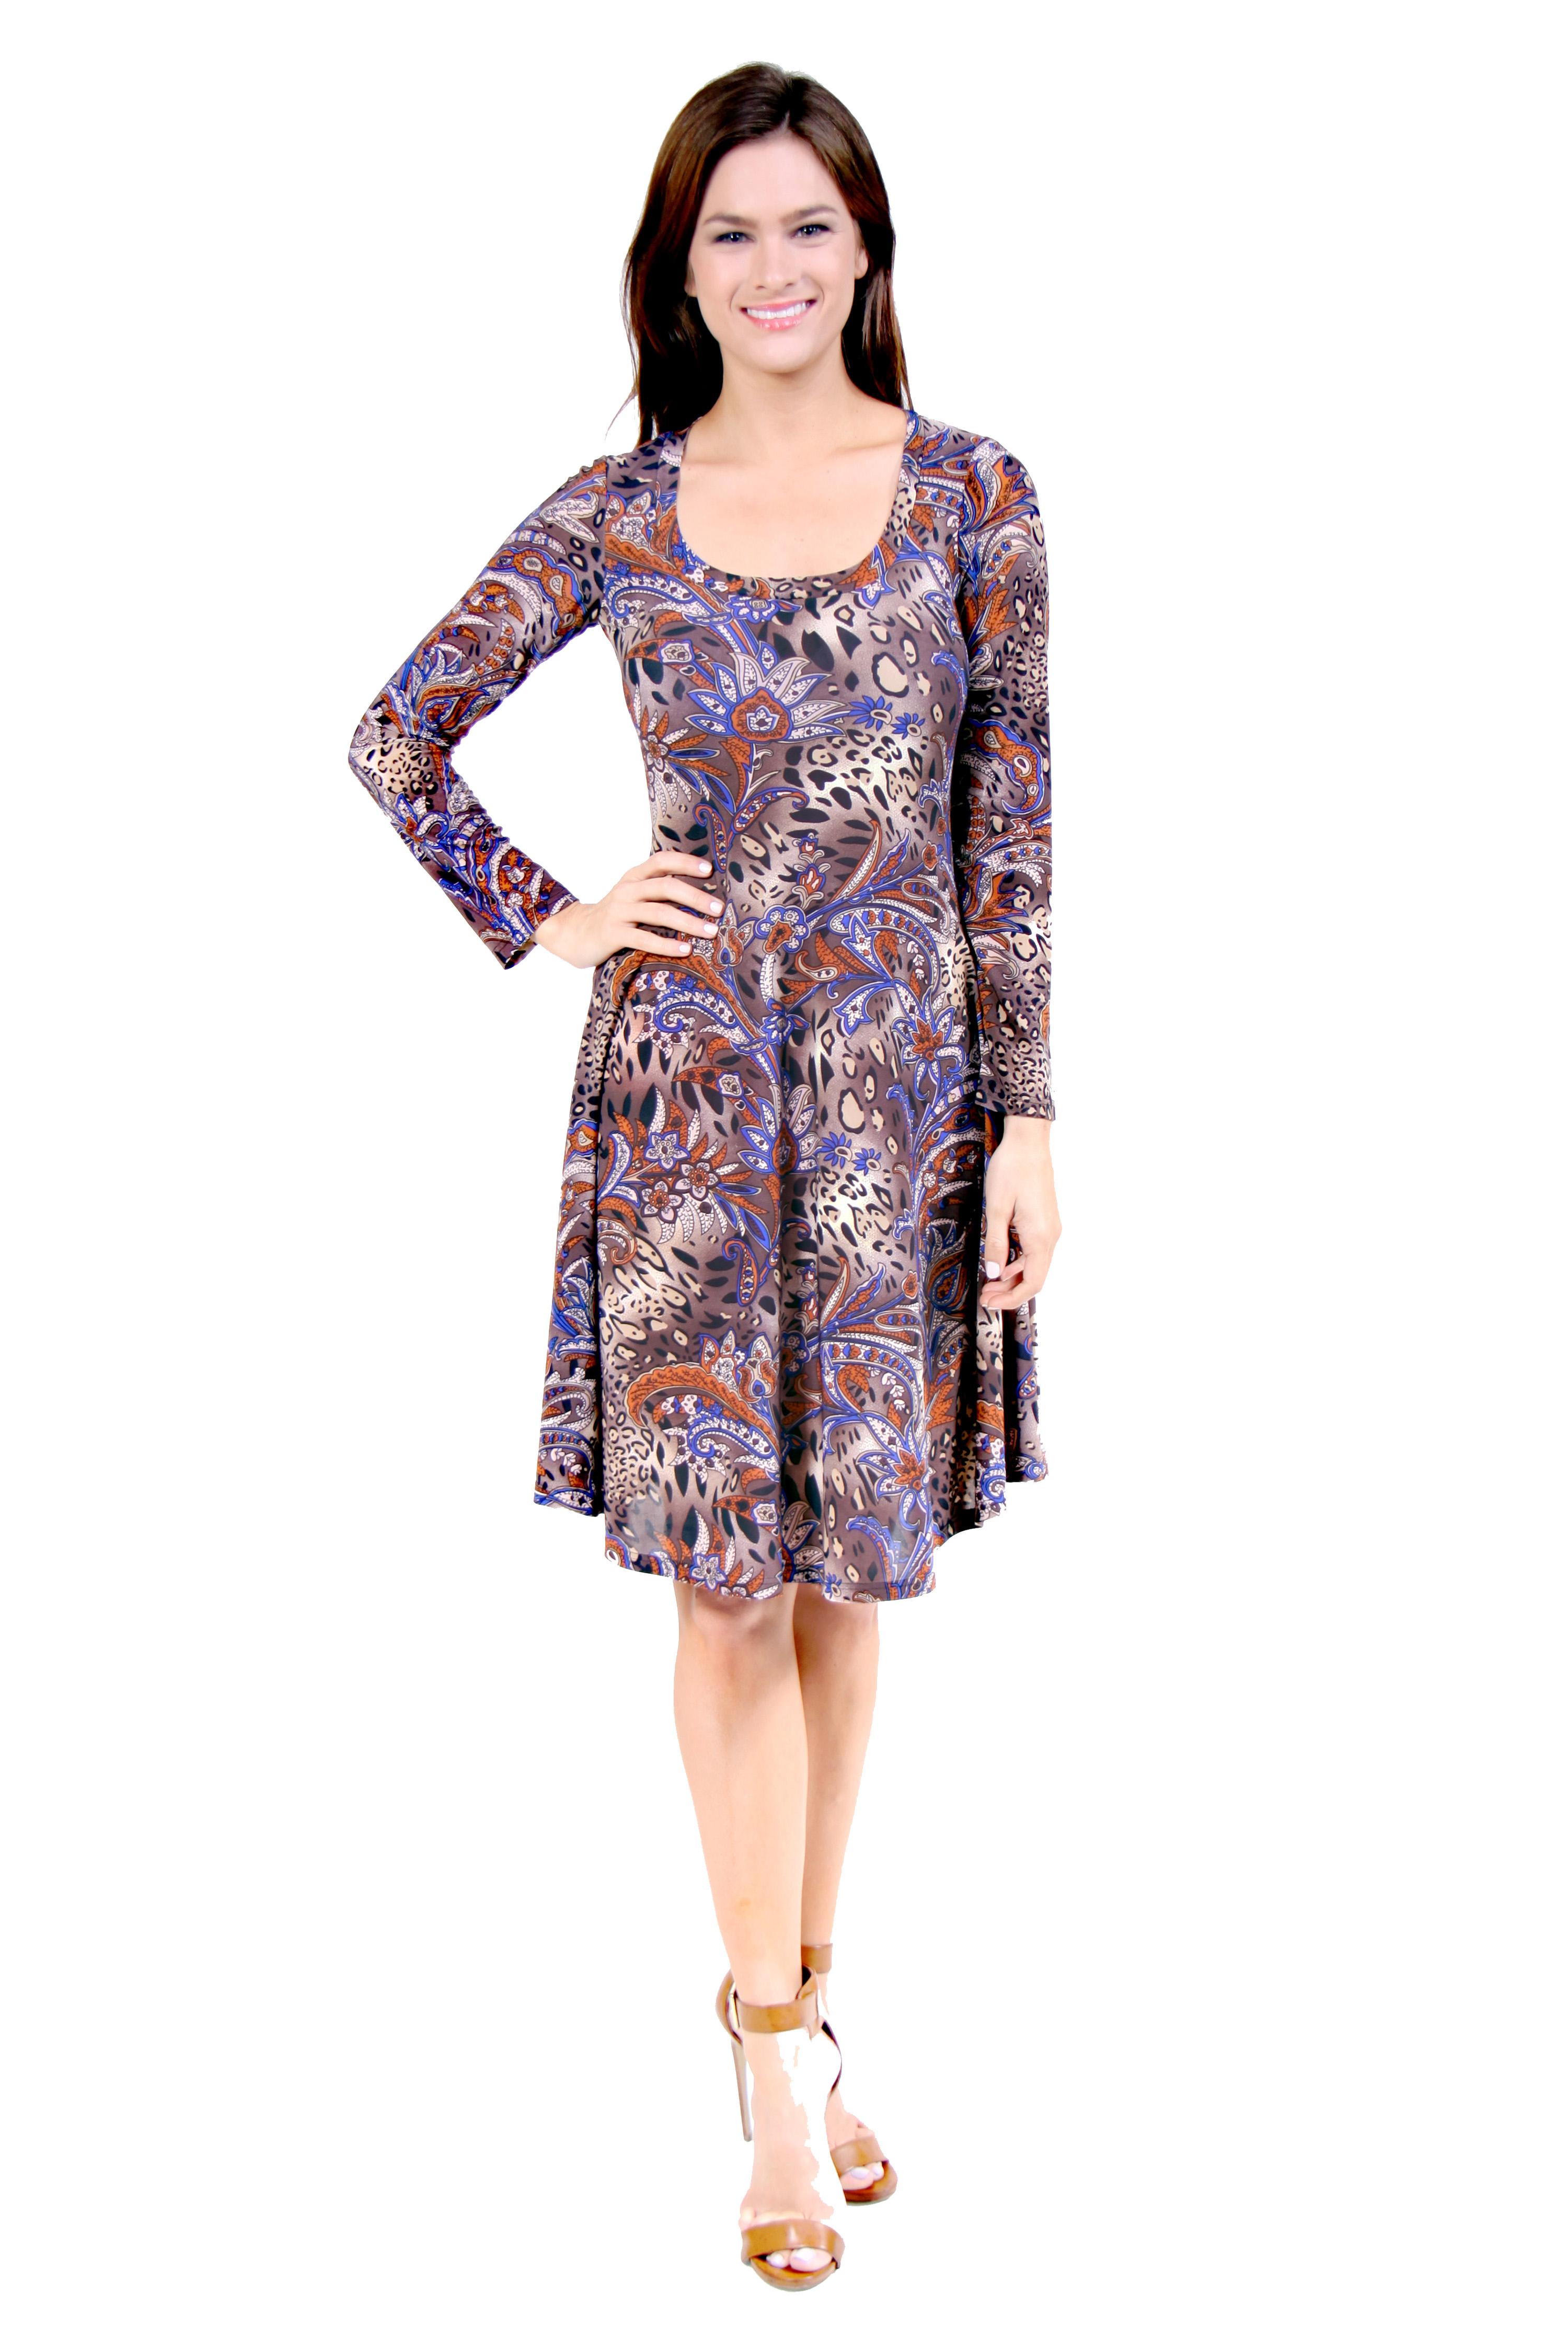 24/7 Comfort Apparel Women's Animal Paisley Print Dress PartNumber: 3ZZVA79549712P MfgPartNumber: 610PAM